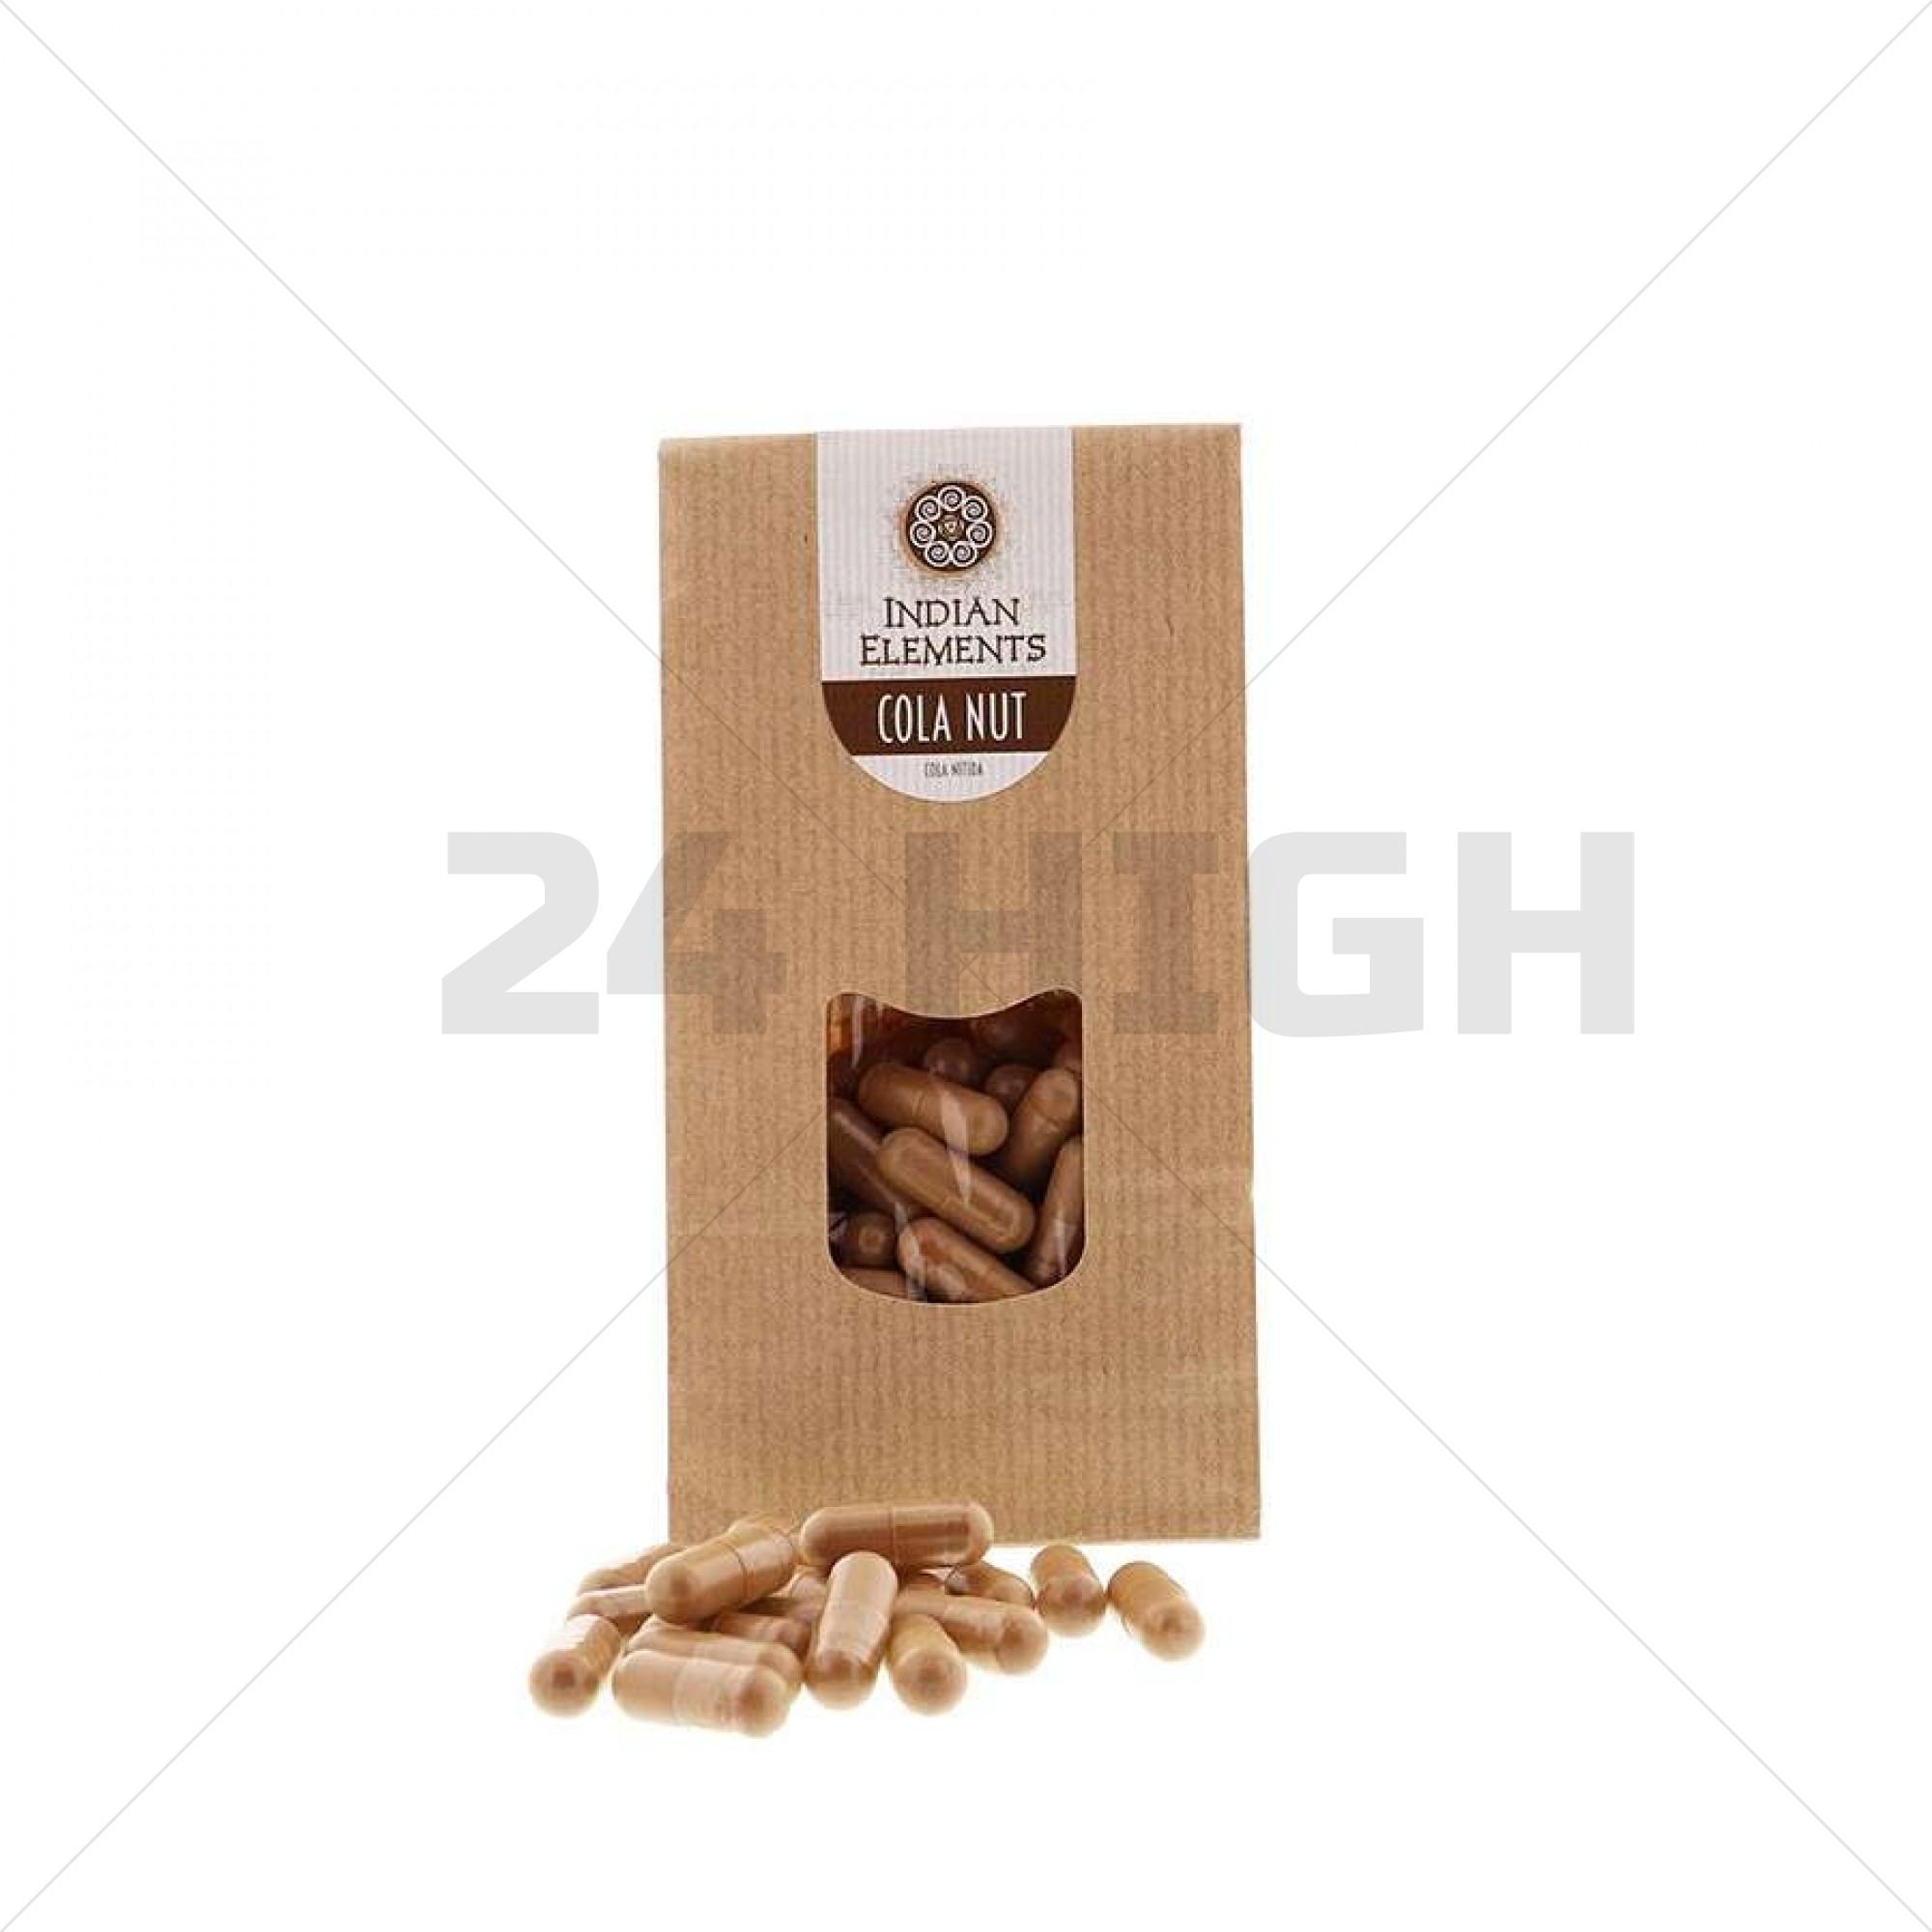 Cola Nuez Indian Elements - Capsulas